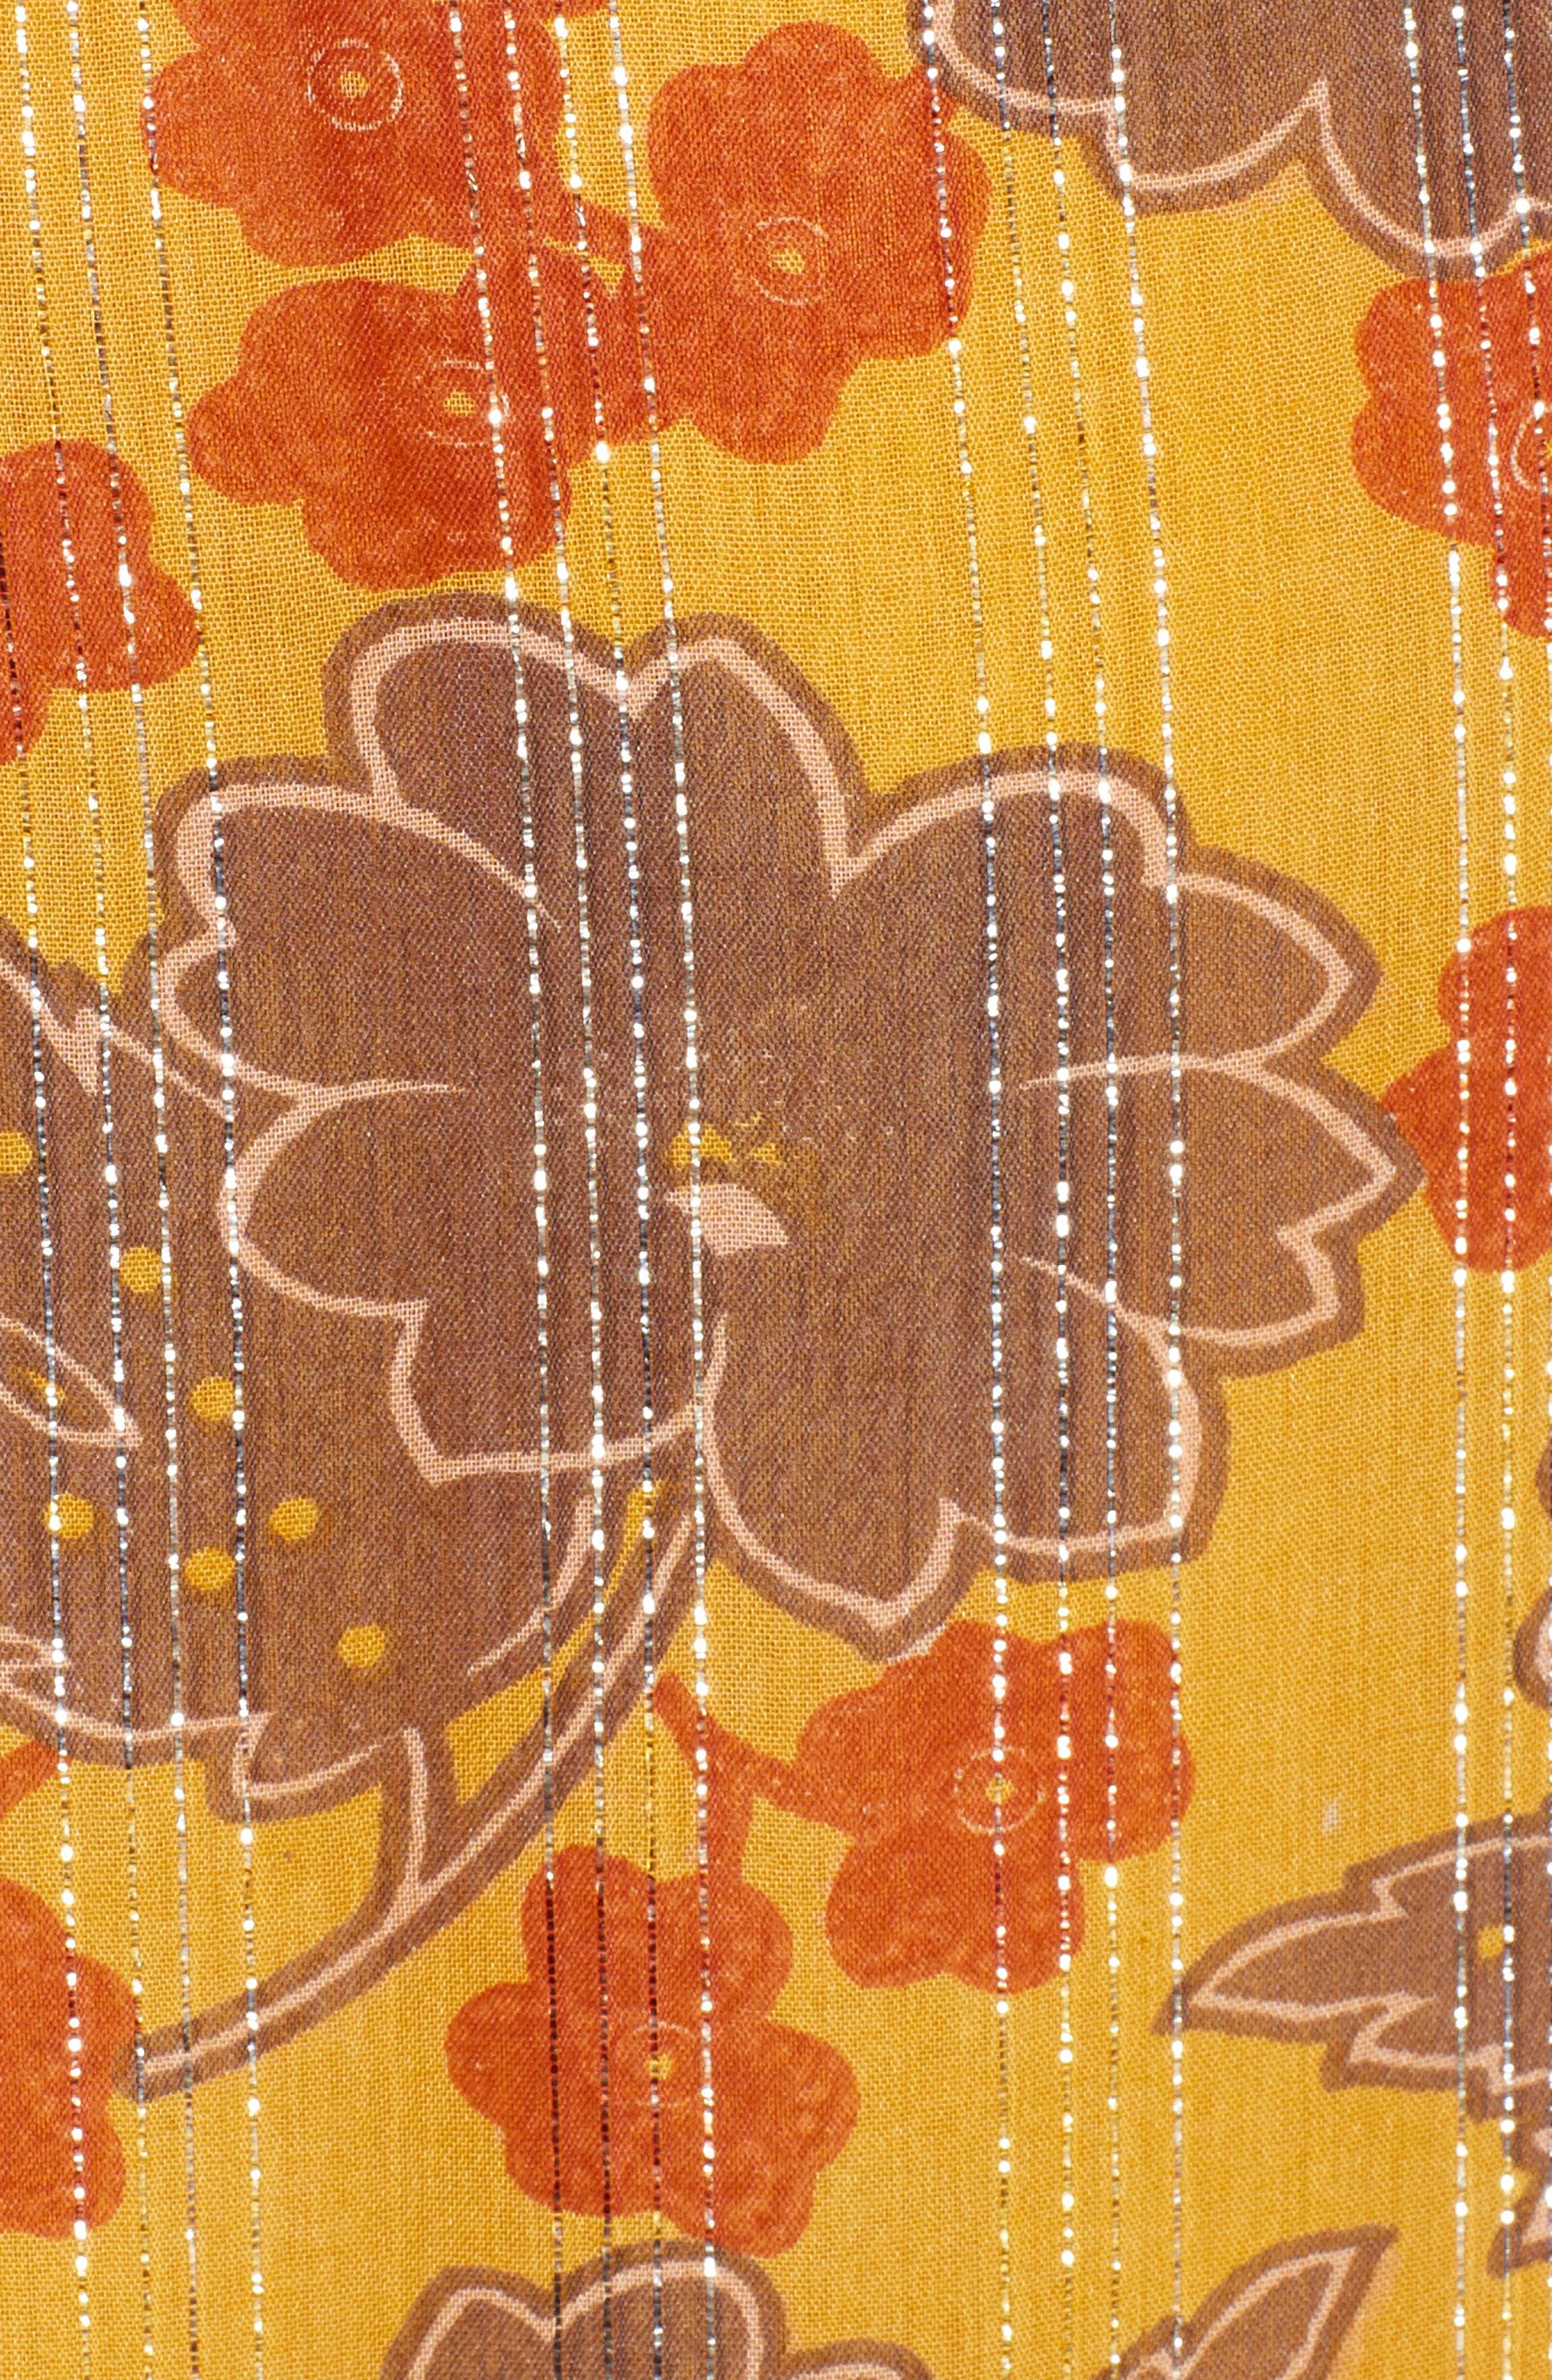 Metallic Stripe Floral Print Dress,                             Alternate thumbnail 5, color,                             YELLOW AND BURGUNDY